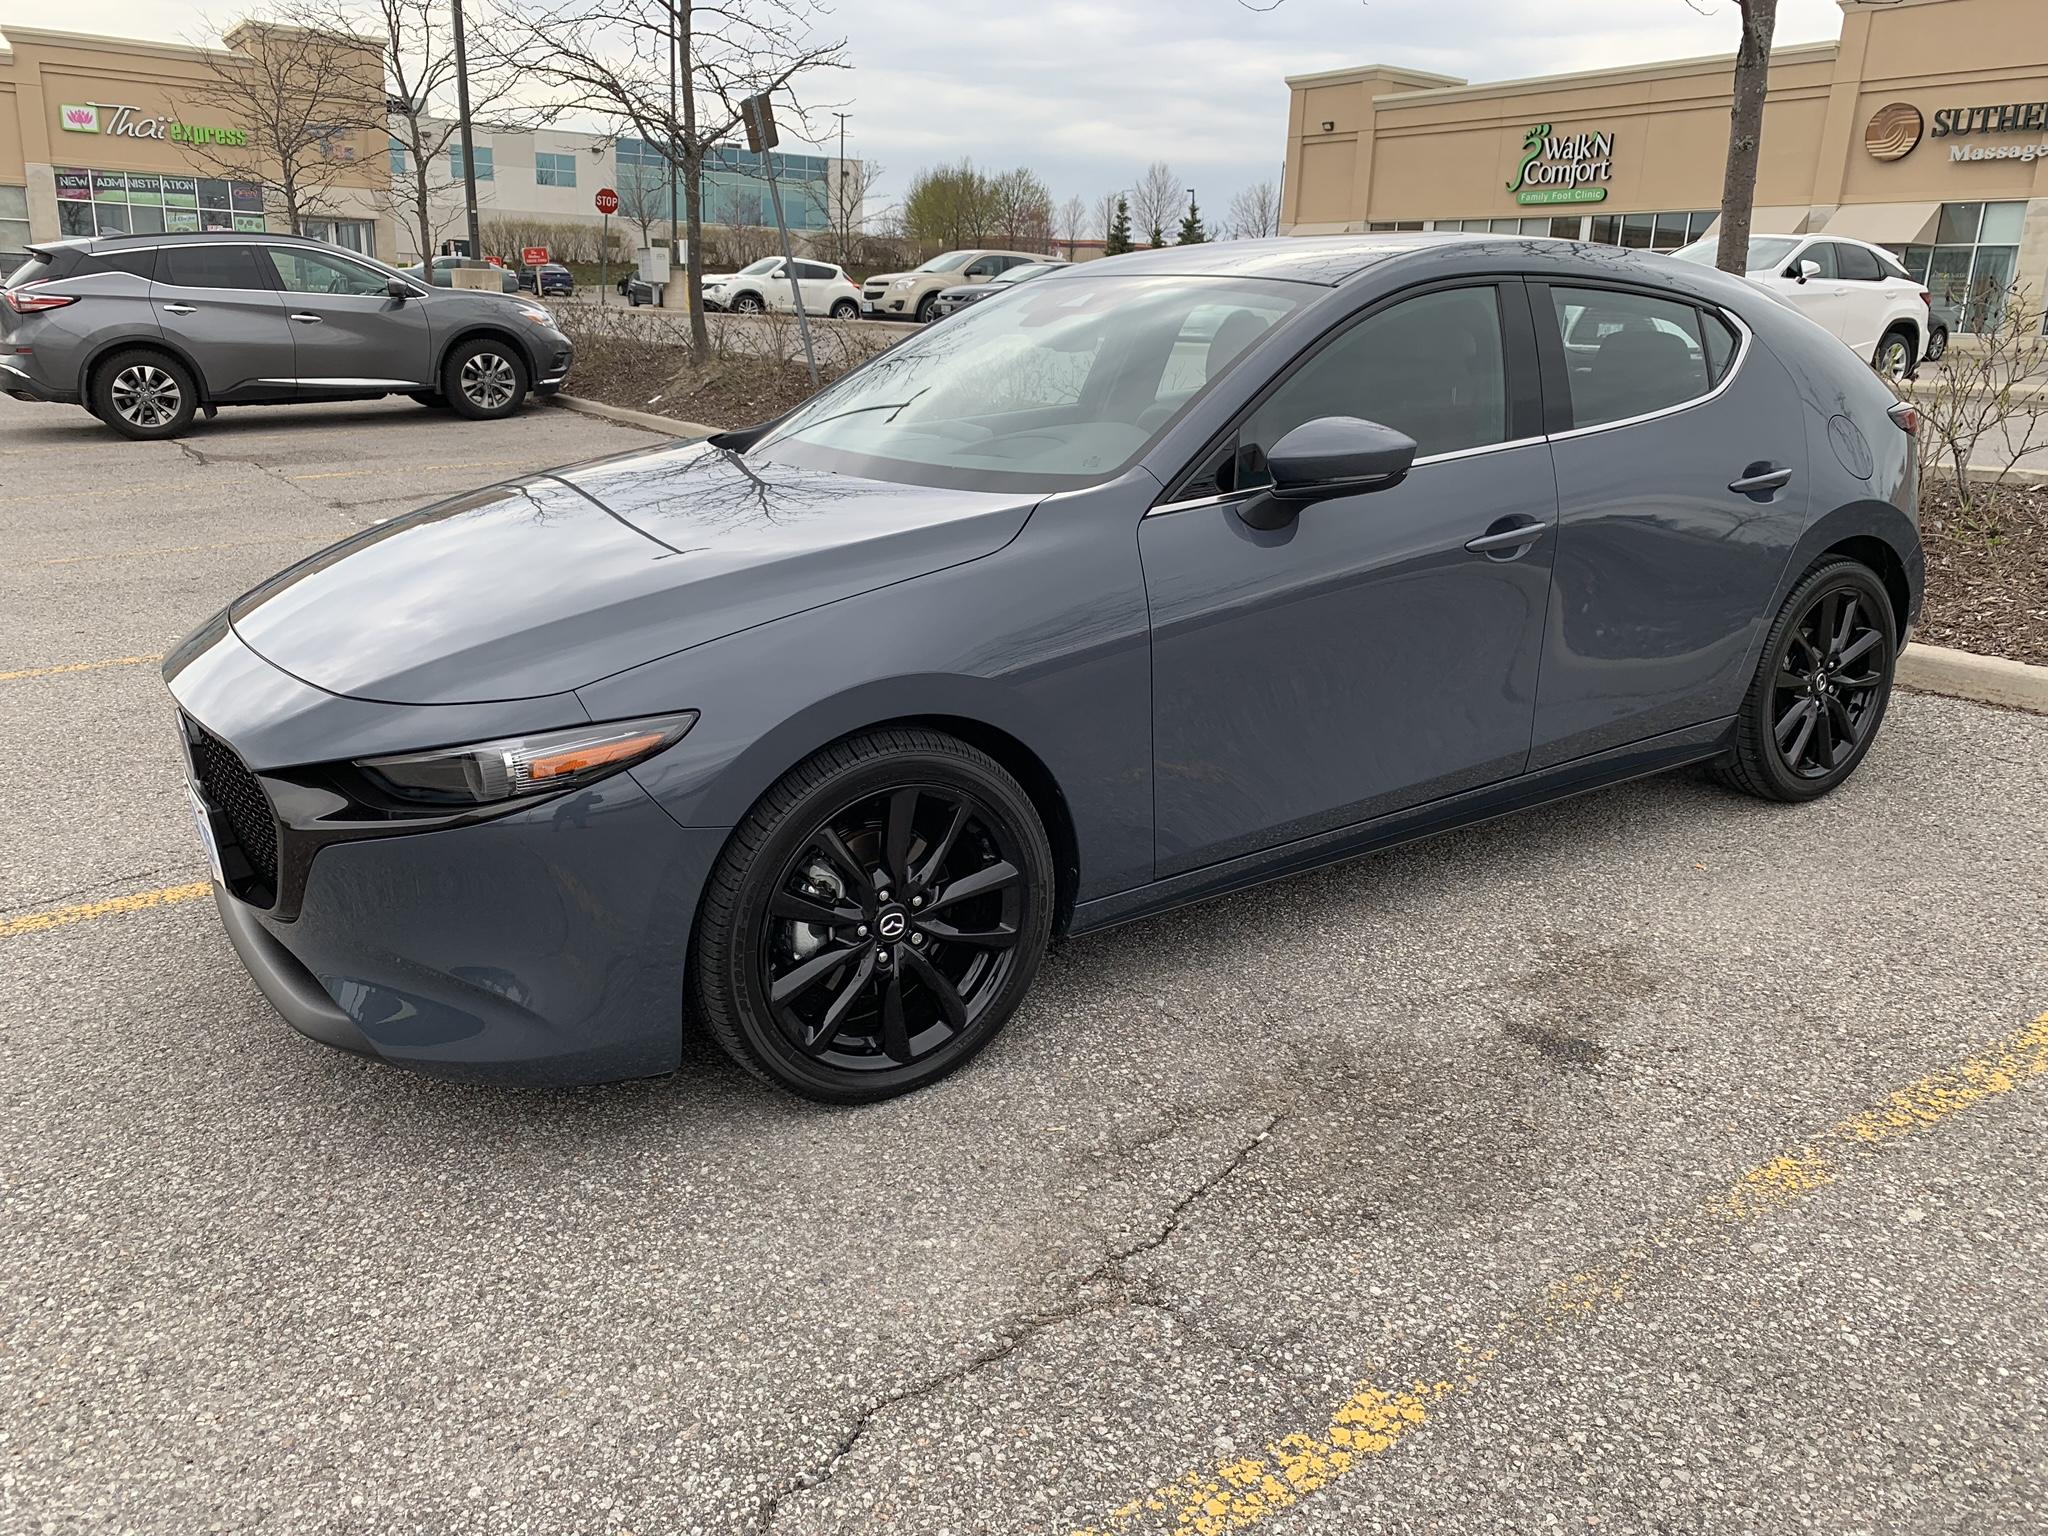 Mazda | The IT Nerd